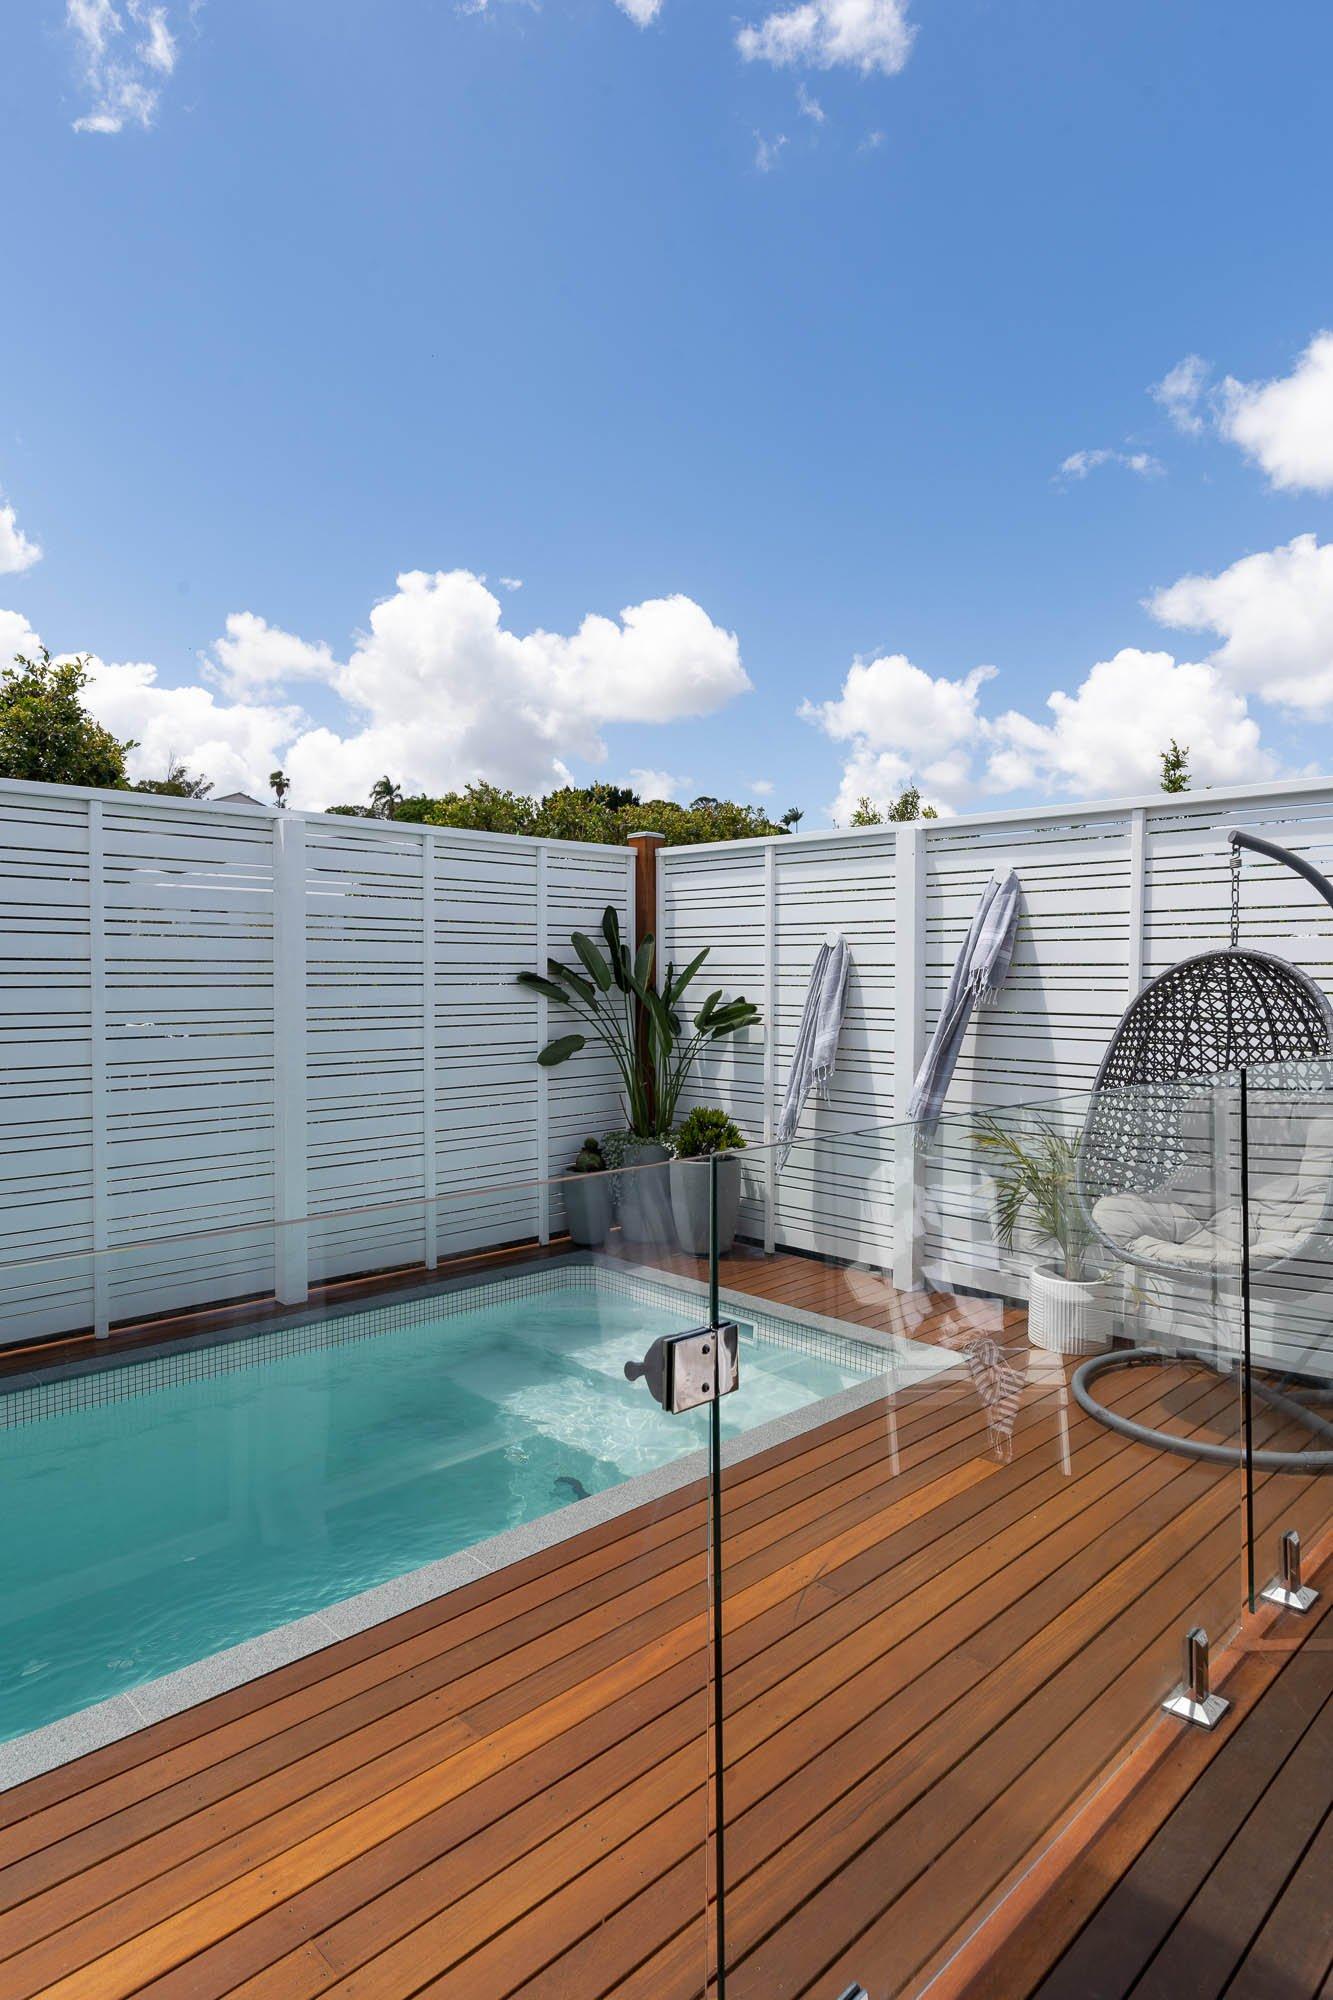 Plungie Studio 12ft x 7ft concrete plunge pool in Kona Coast